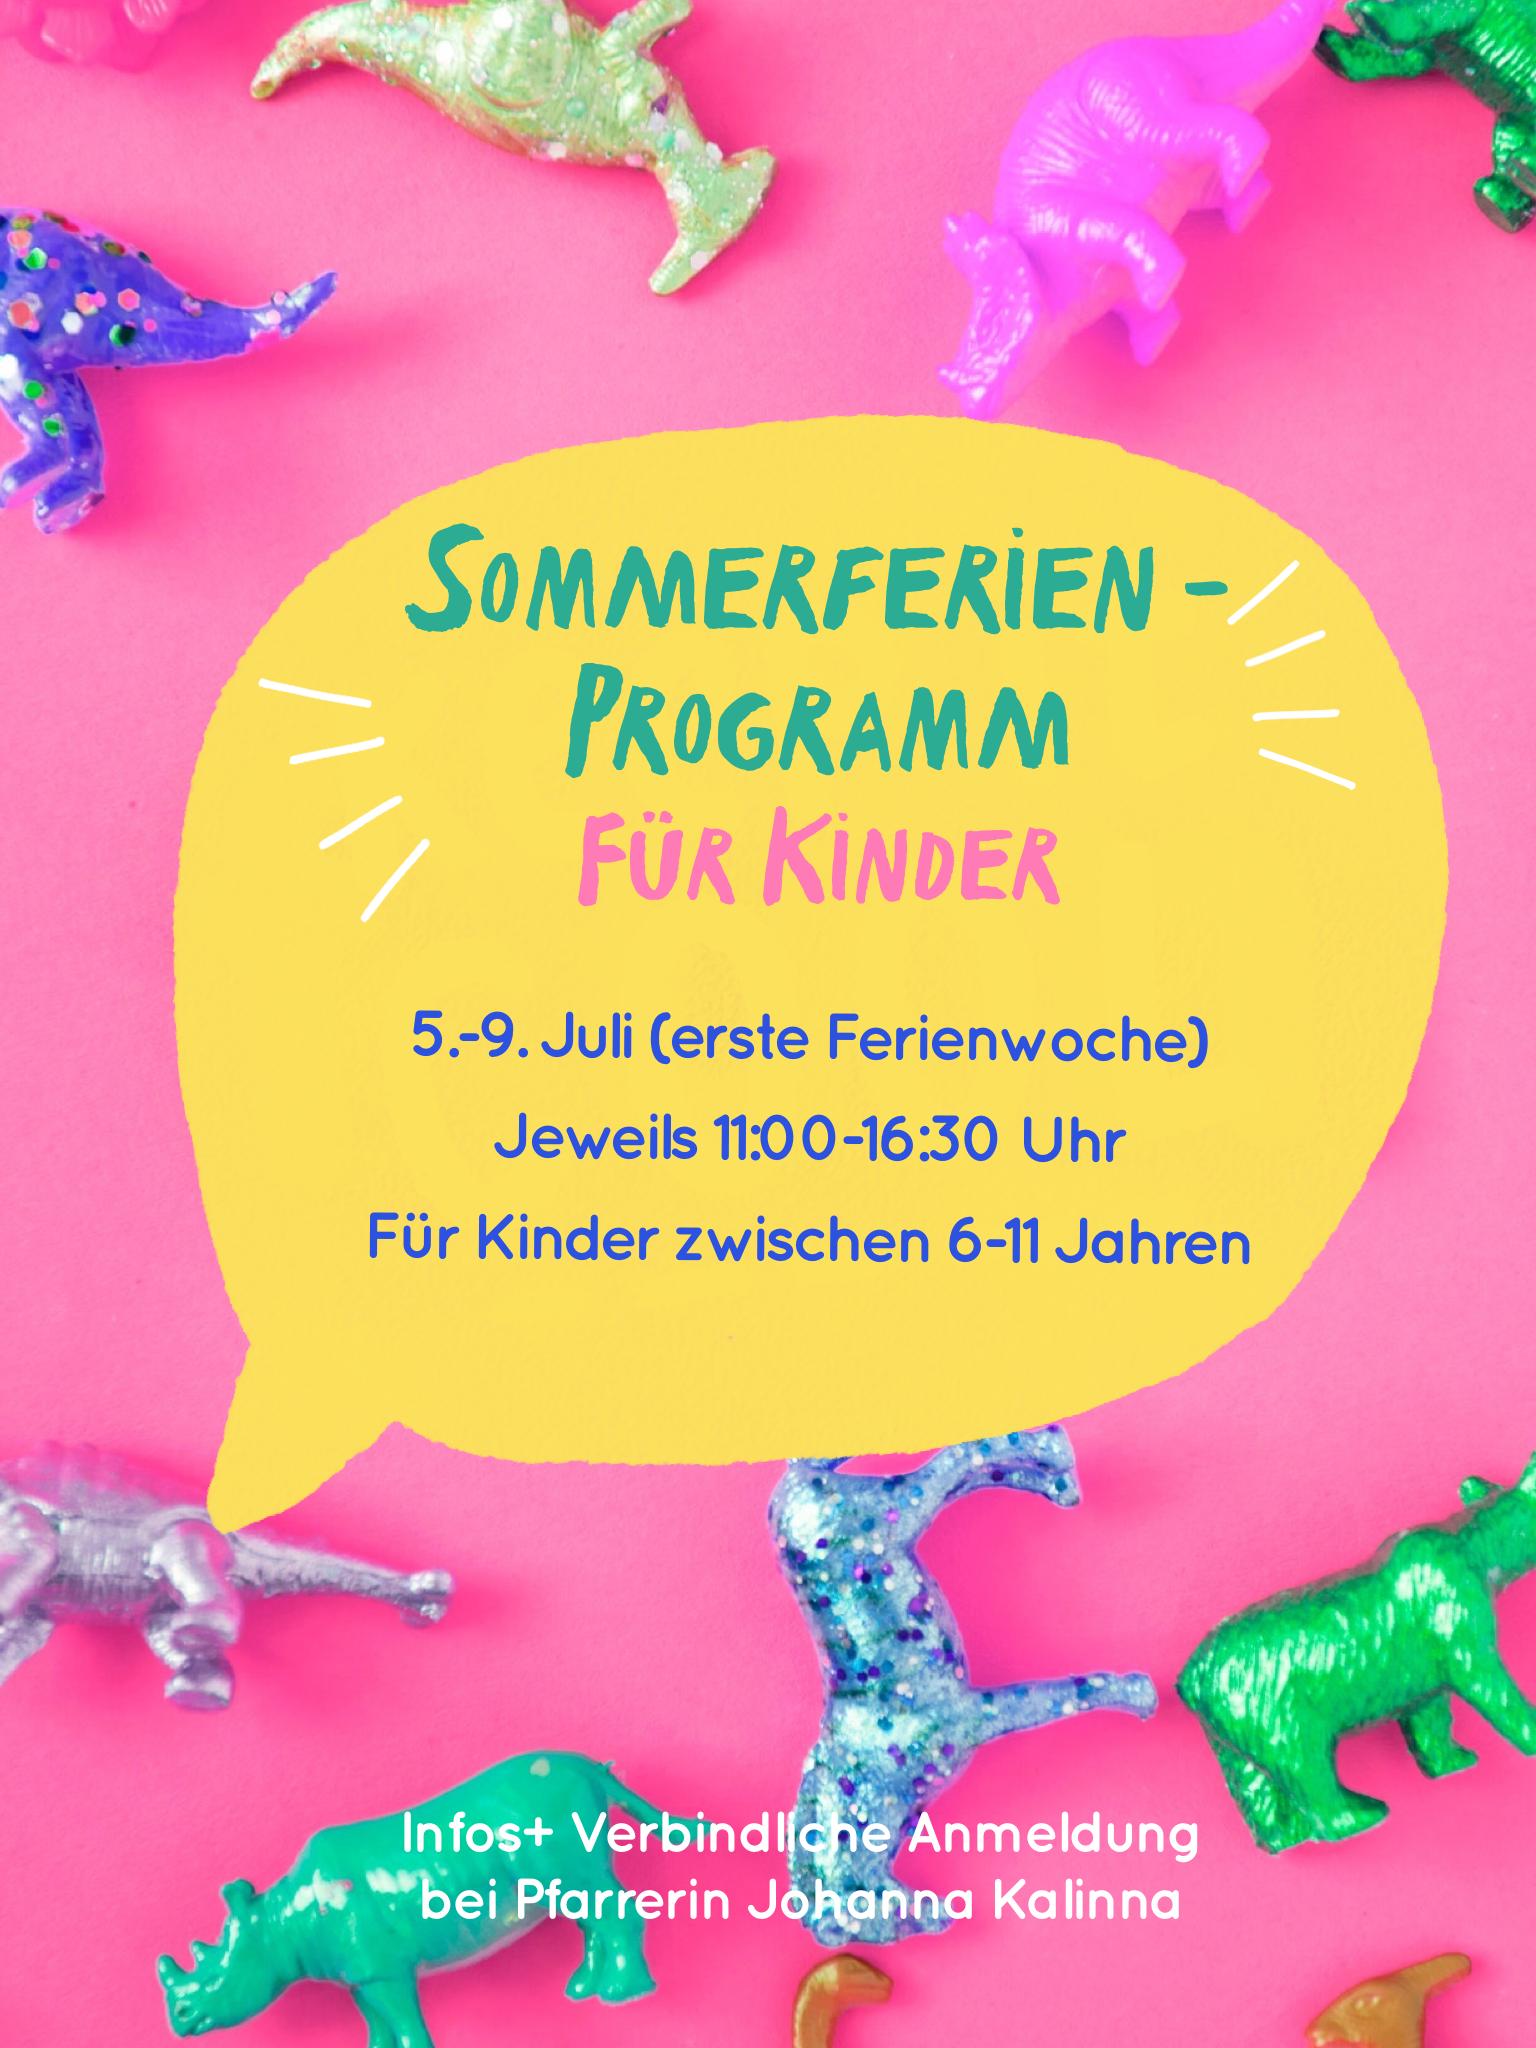 You are currently viewing Sommerferienprogramm für Kinder